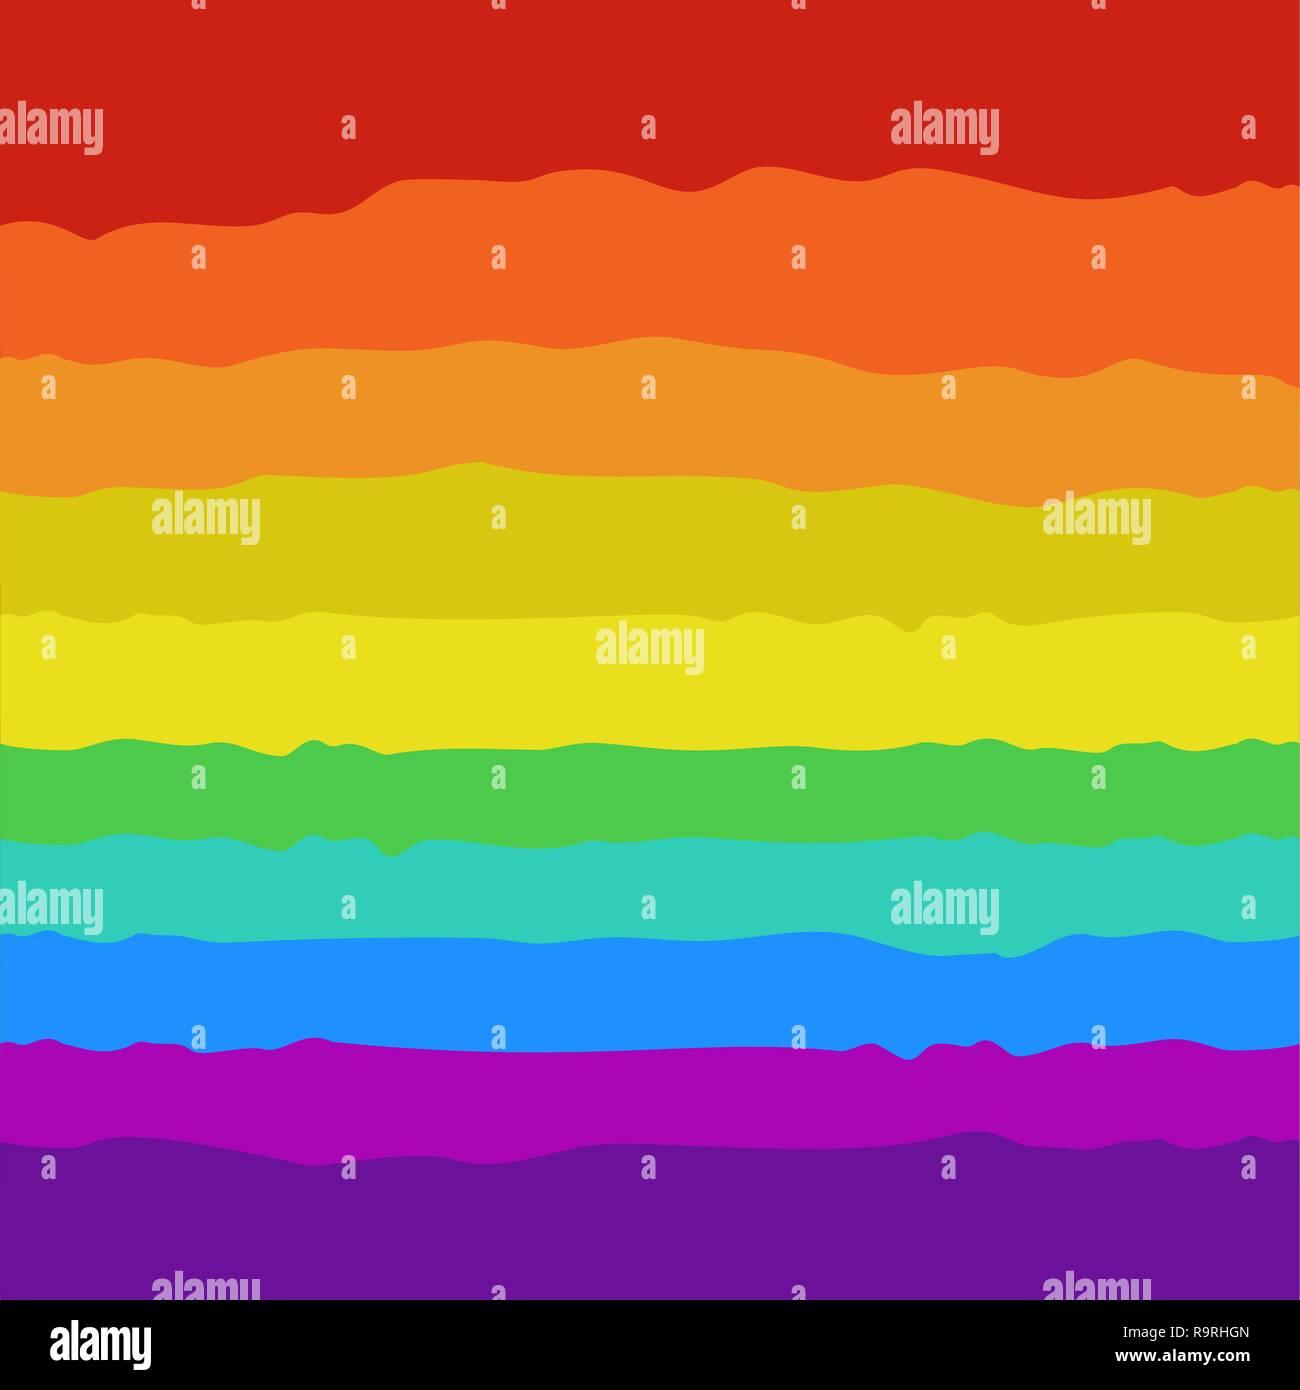 Simple style cute cartoon rainbow background - Stock Image